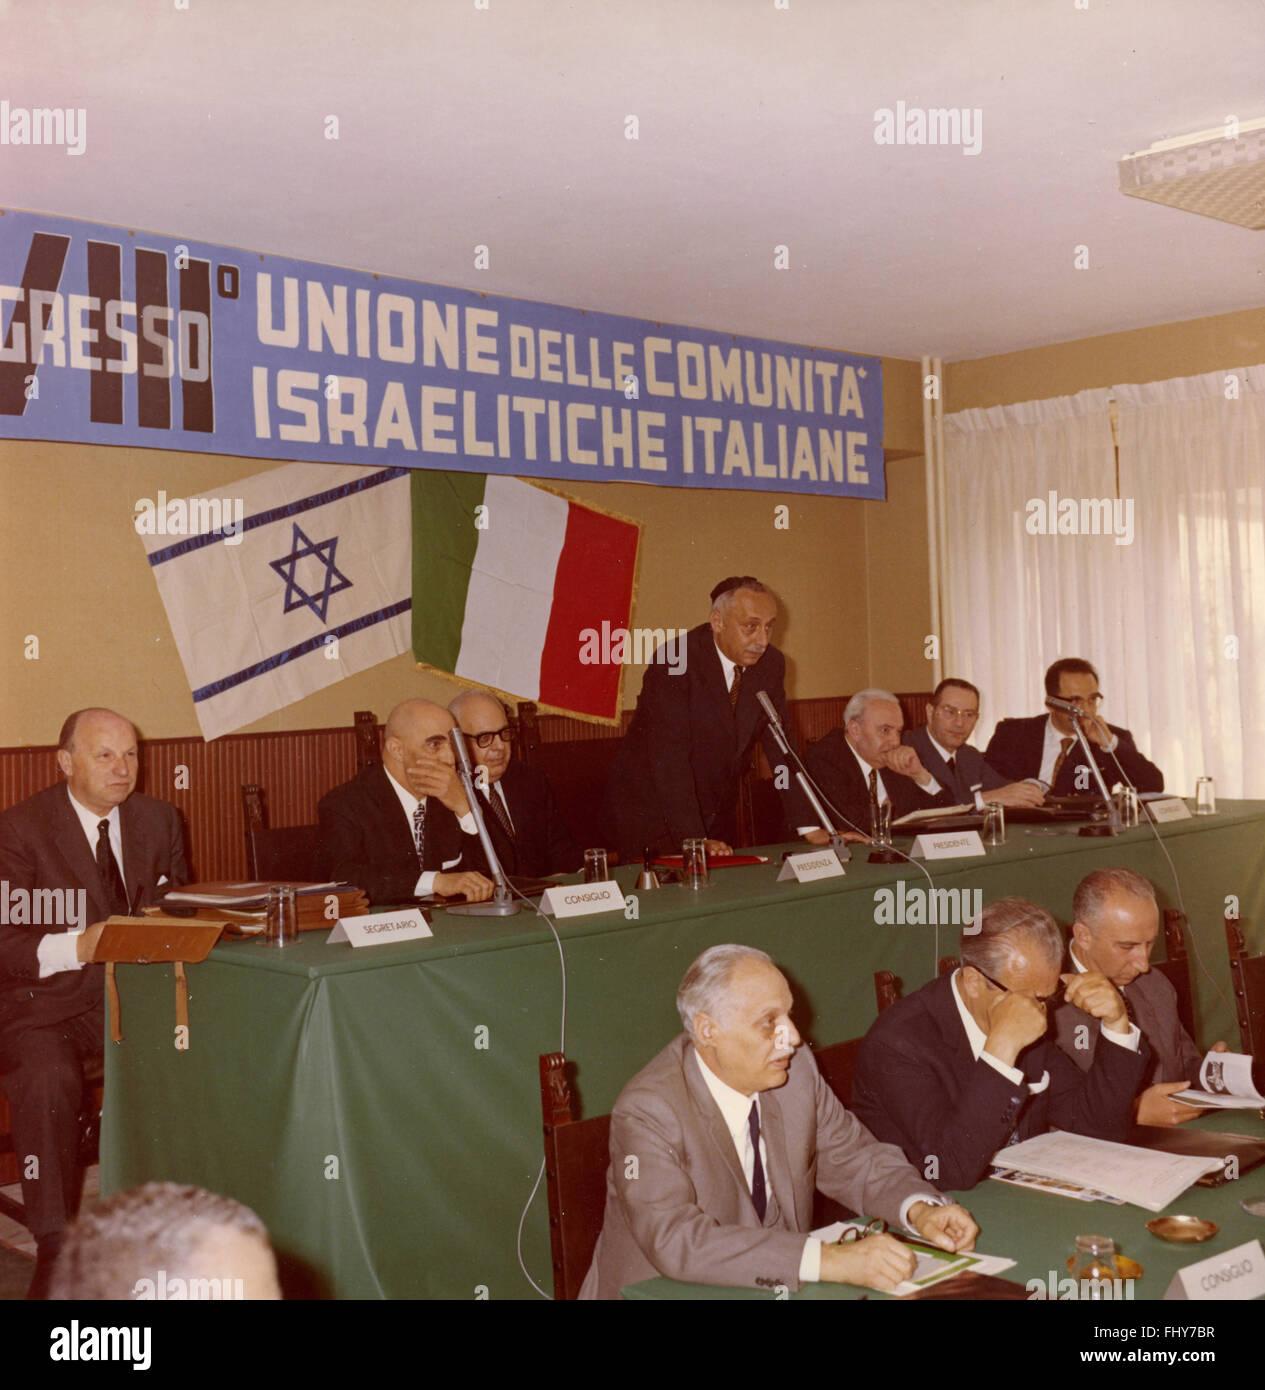 VIII Congress of Jewish Communities, Rome, Italy, 1970 - Stock Image